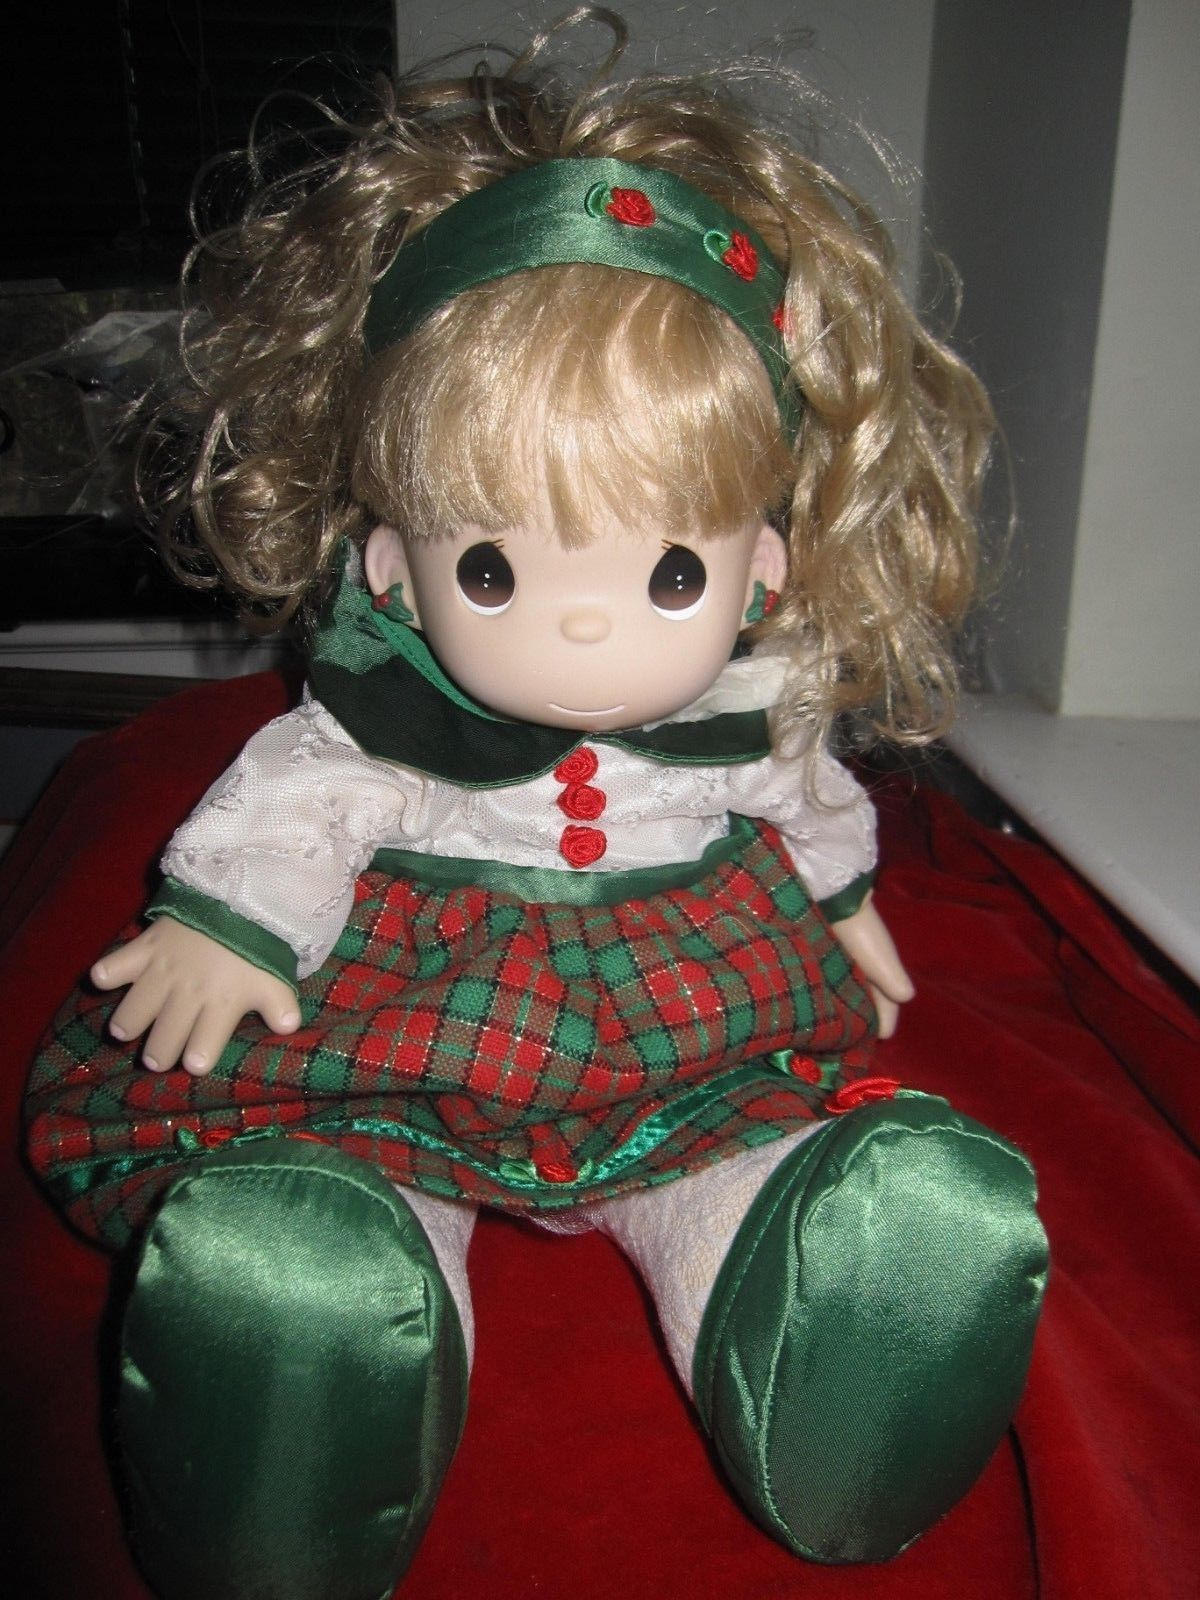 Vintage 1998 Enesco Precious Moments Christmas Doll - $13.96